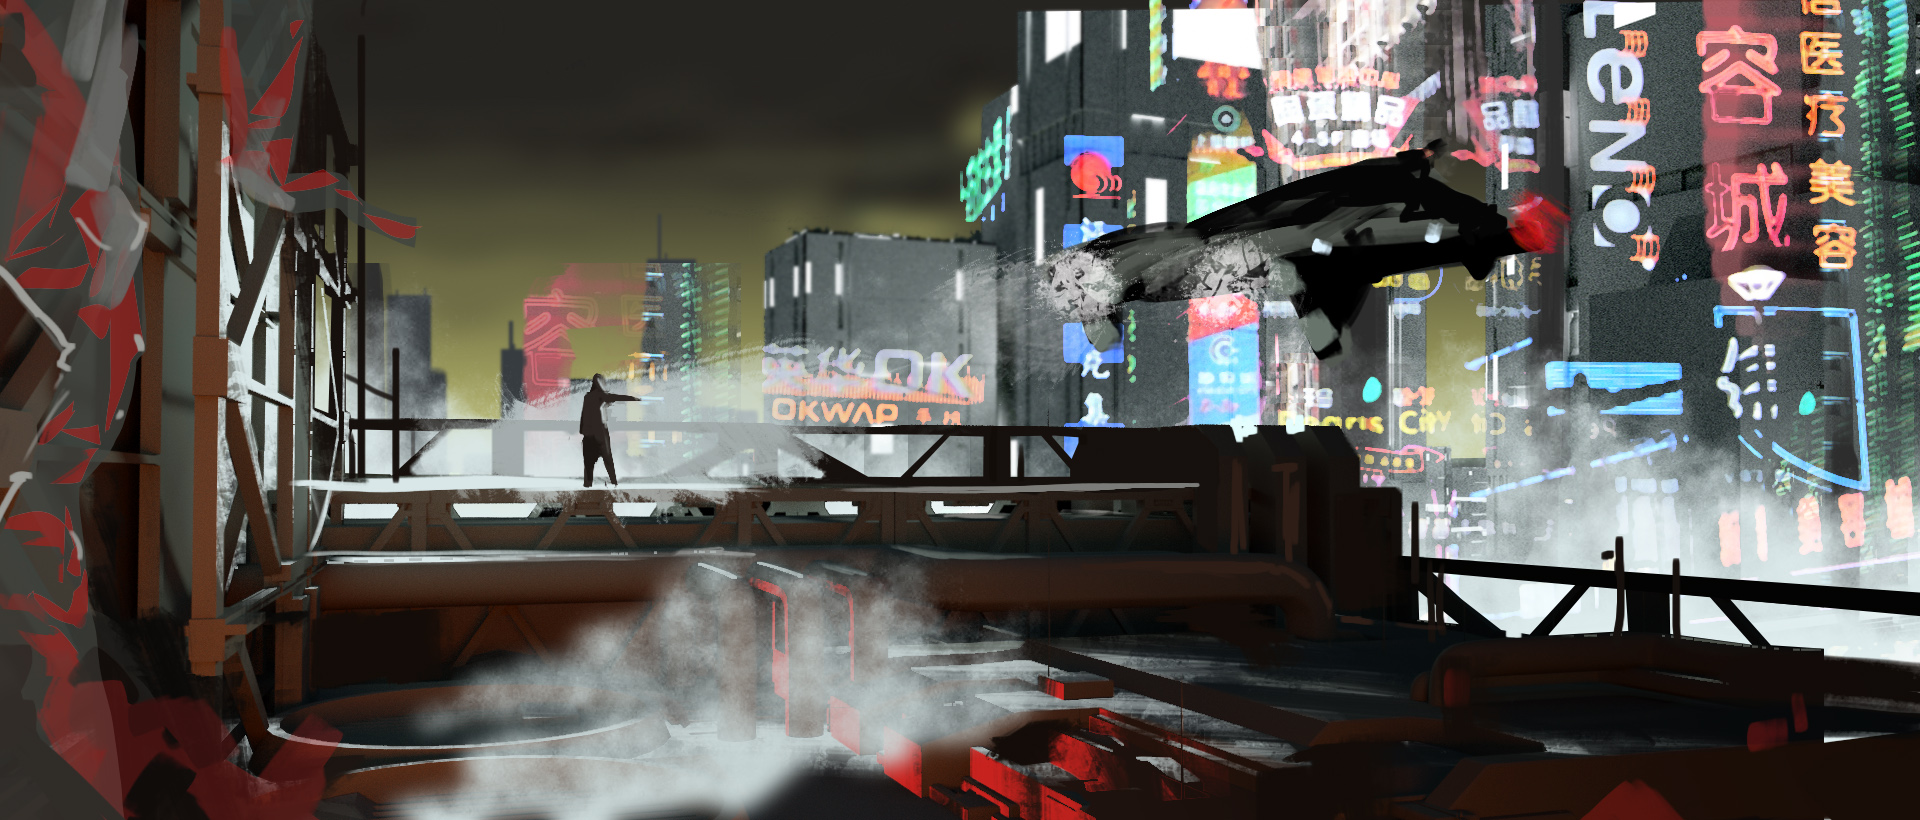 town_night_03.jpg